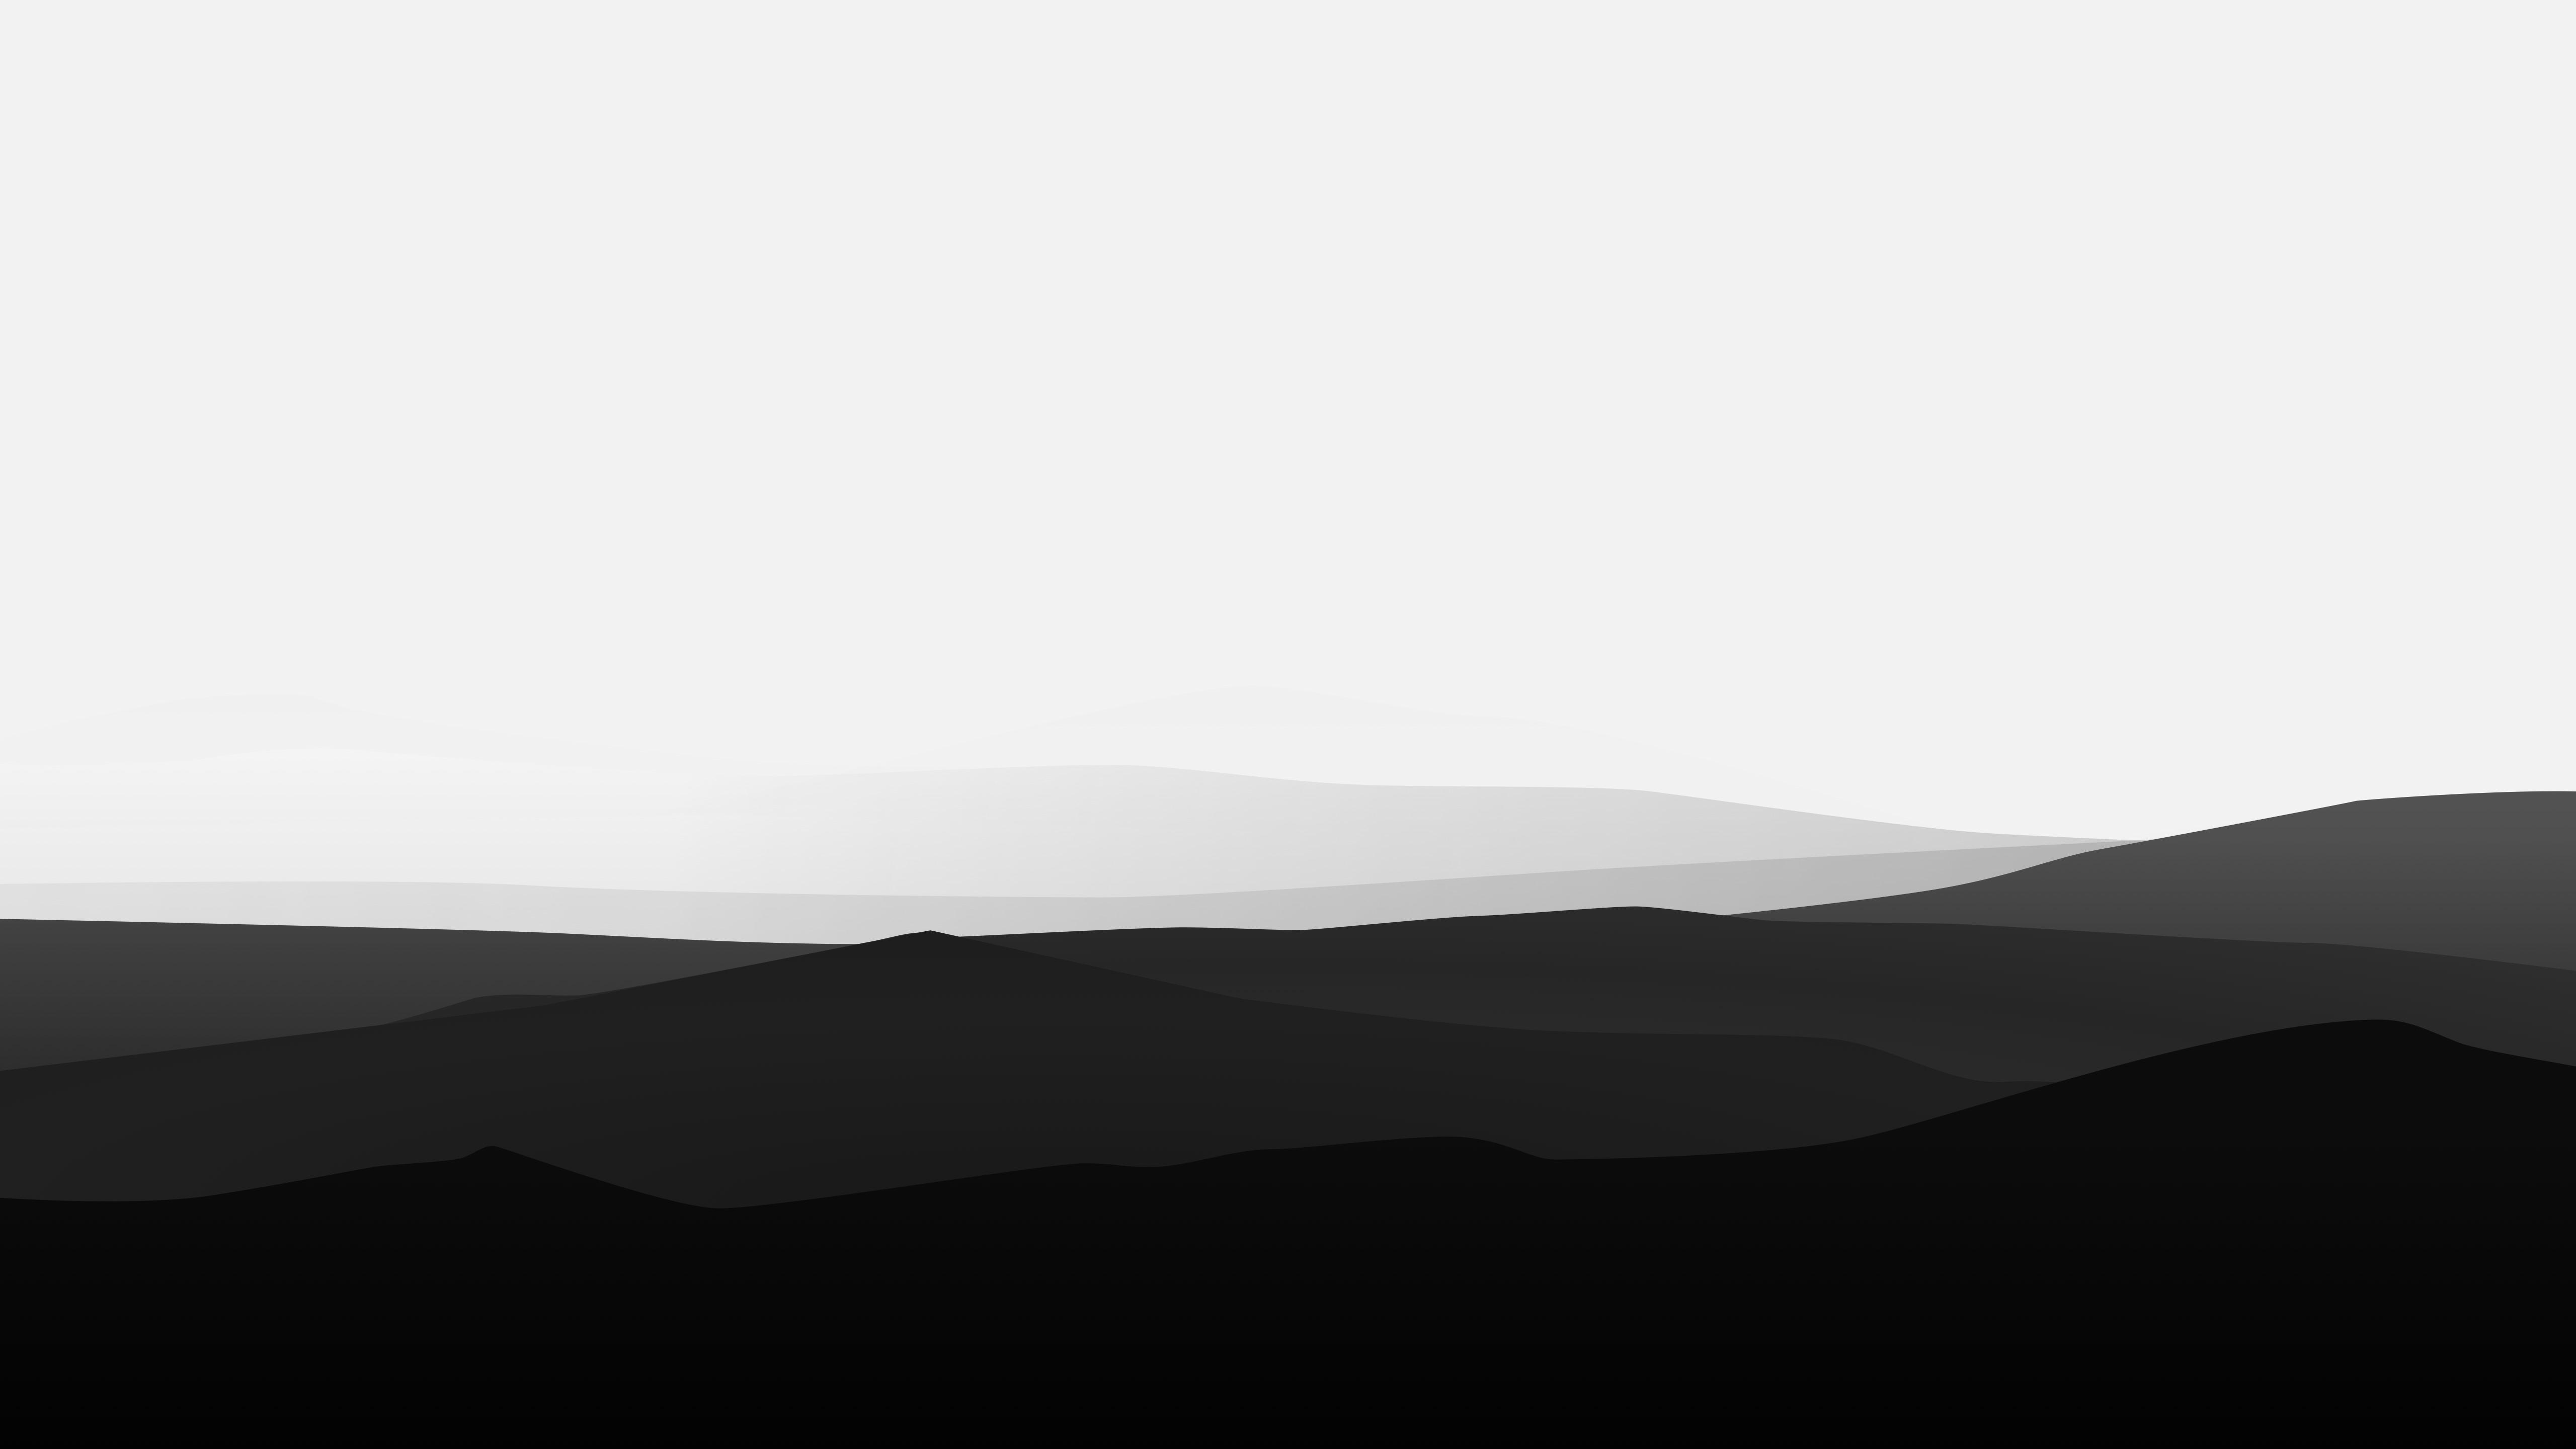 Minimalism 5k Retina Ultra HD Wallpaper | Background Image ...